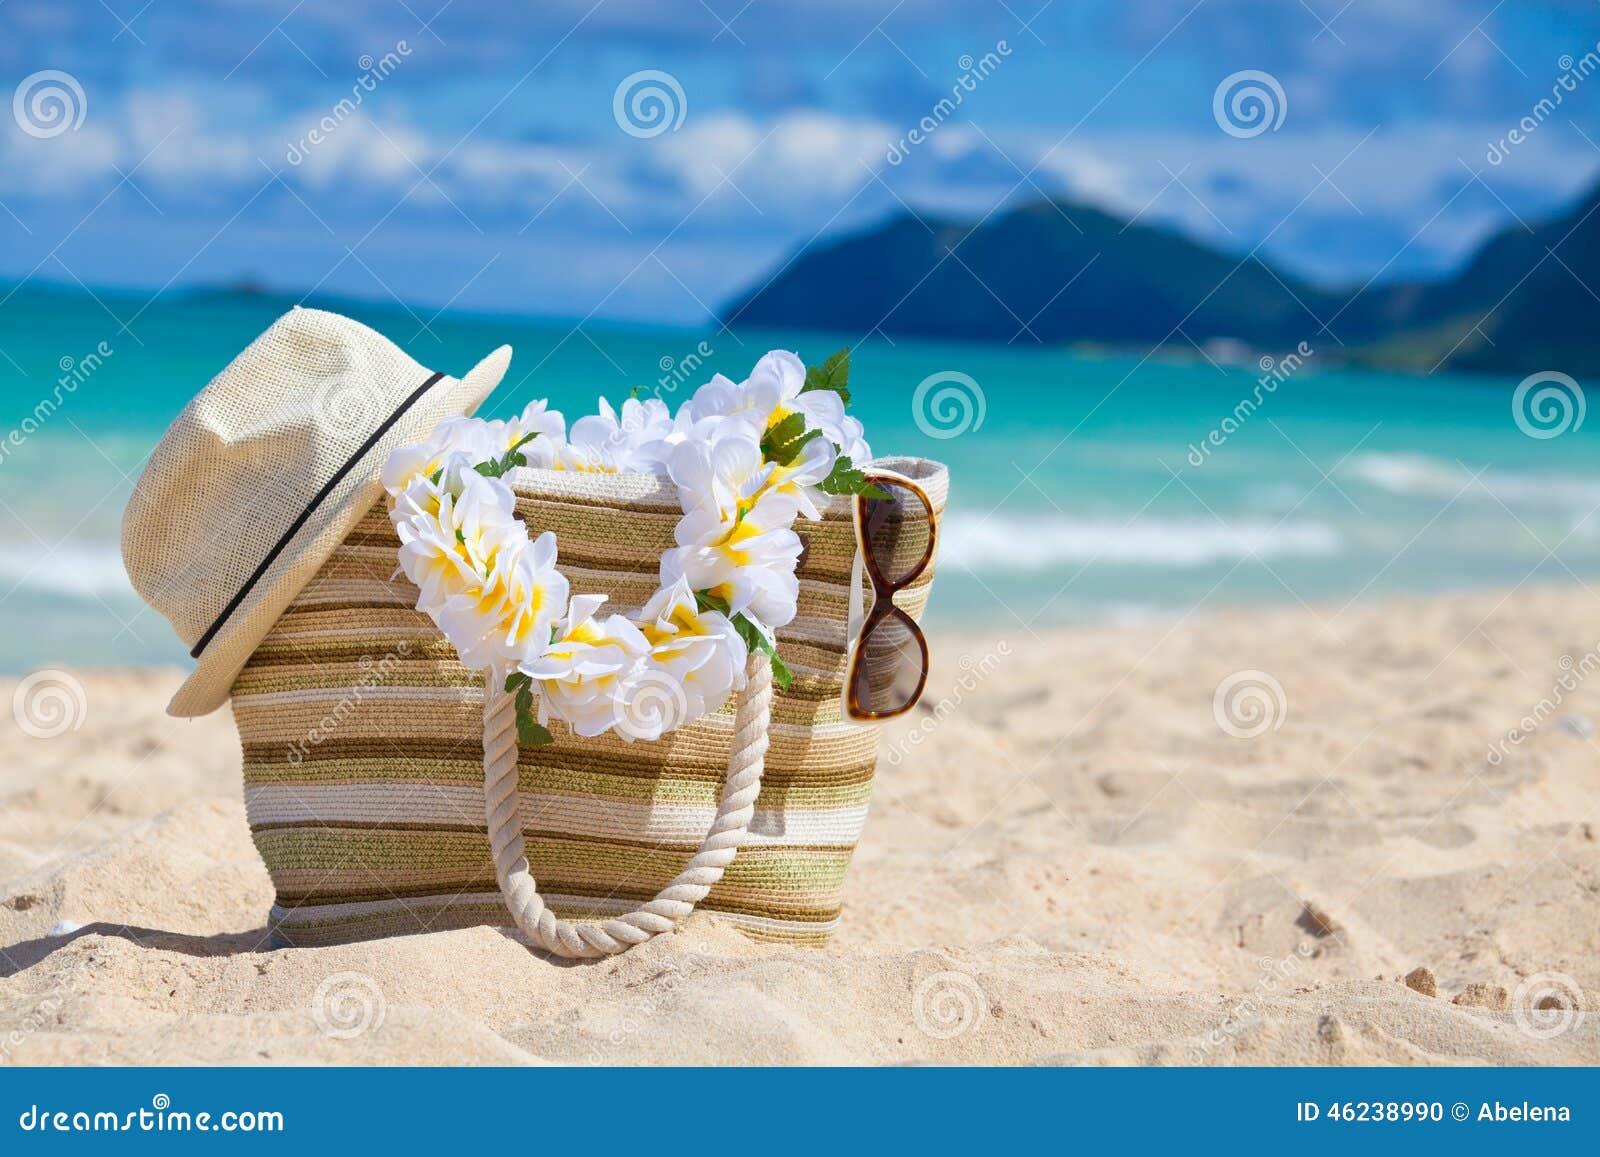 Closeup Of Summer Beach Bag Stock Photo - Image: 46238990